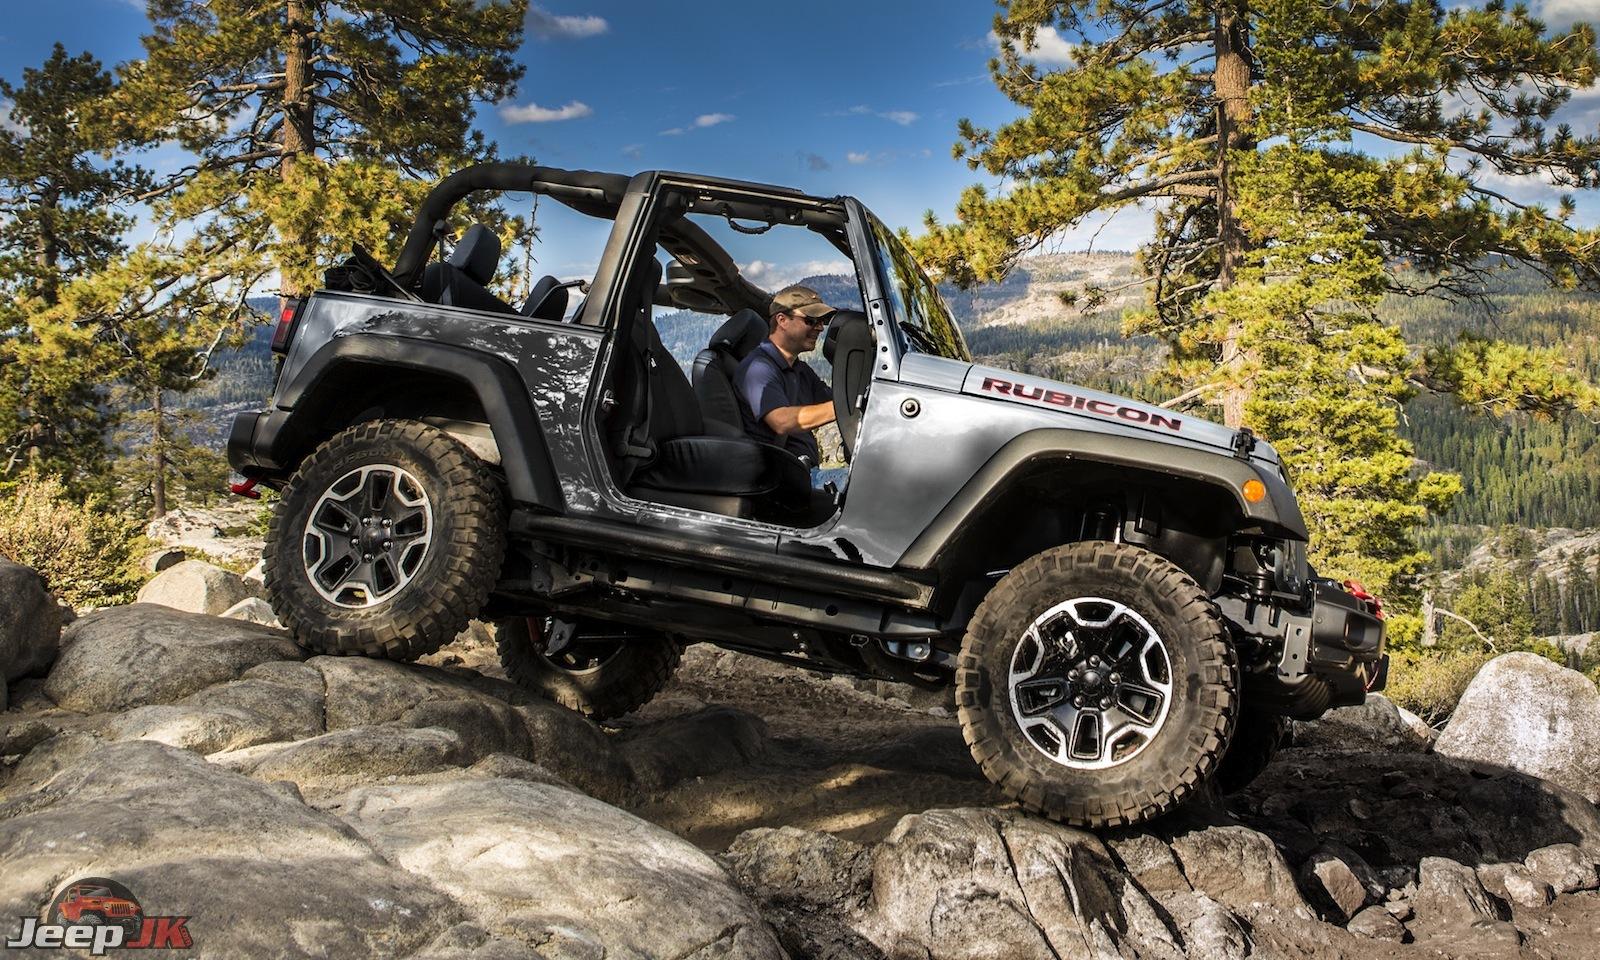 2014 jeep wrangler rubicon x jeep jk. Black Bedroom Furniture Sets. Home Design Ideas